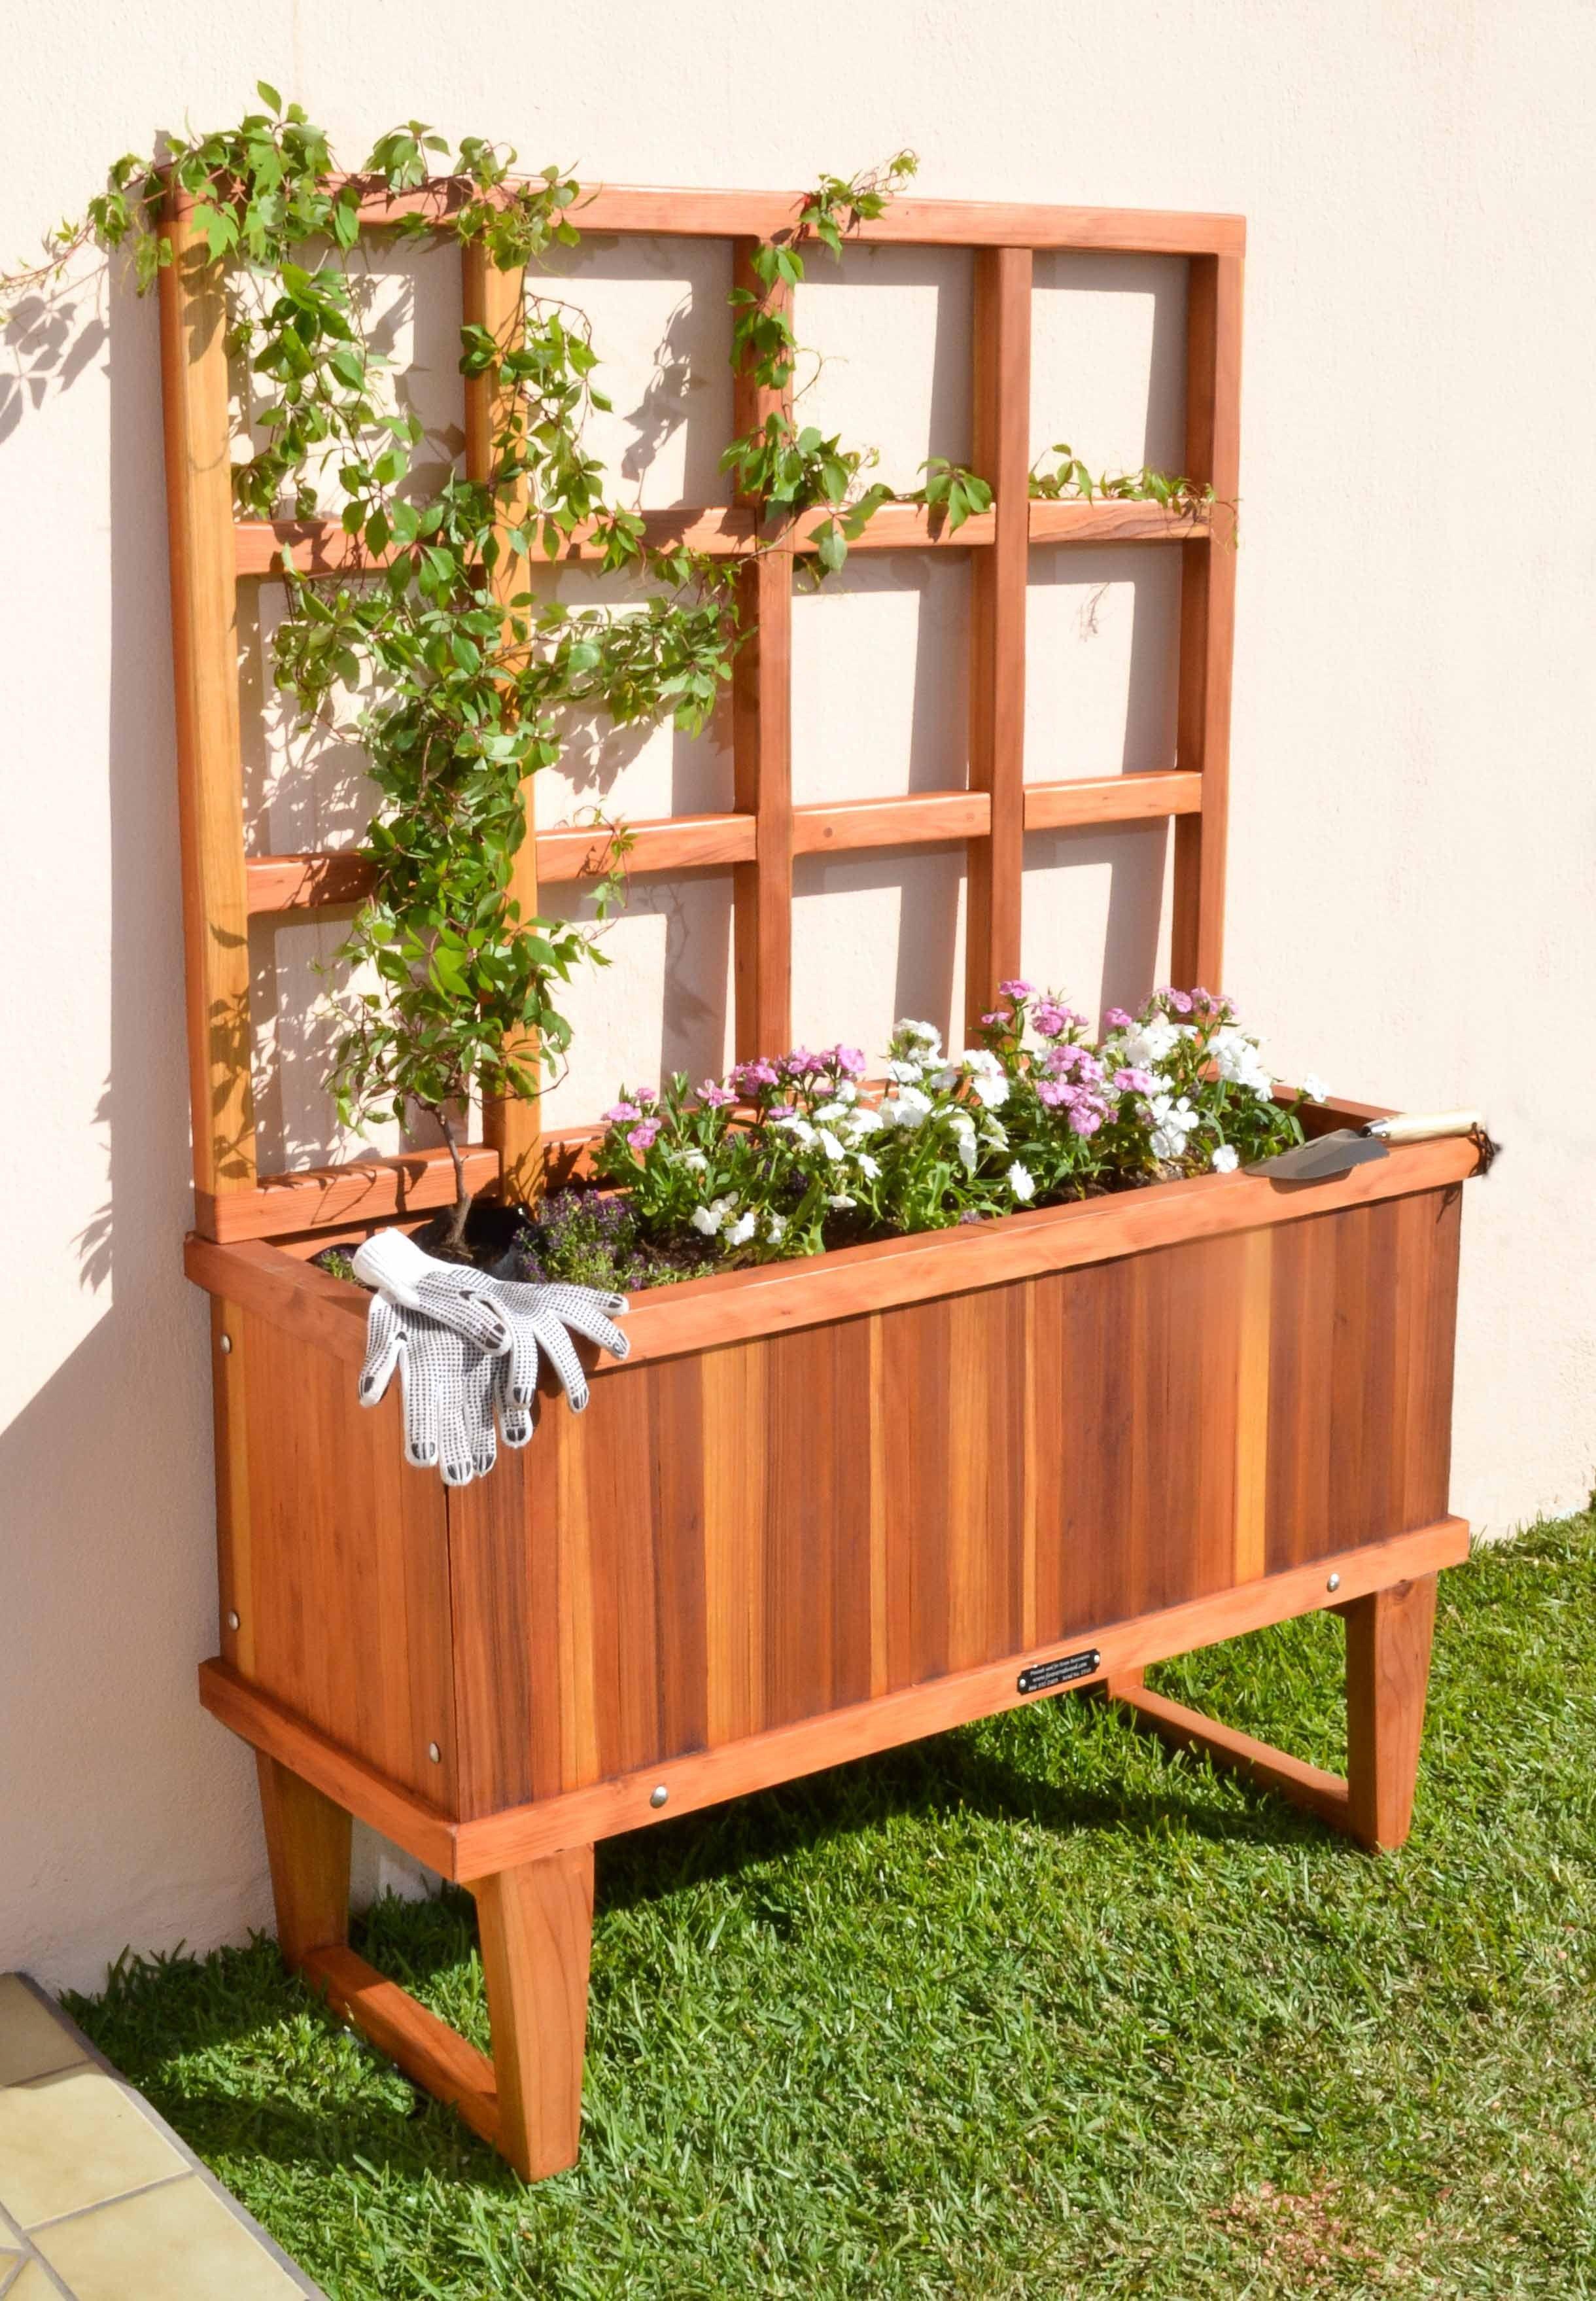 Portable Flower Bed Pallets Garden Redwood Planter